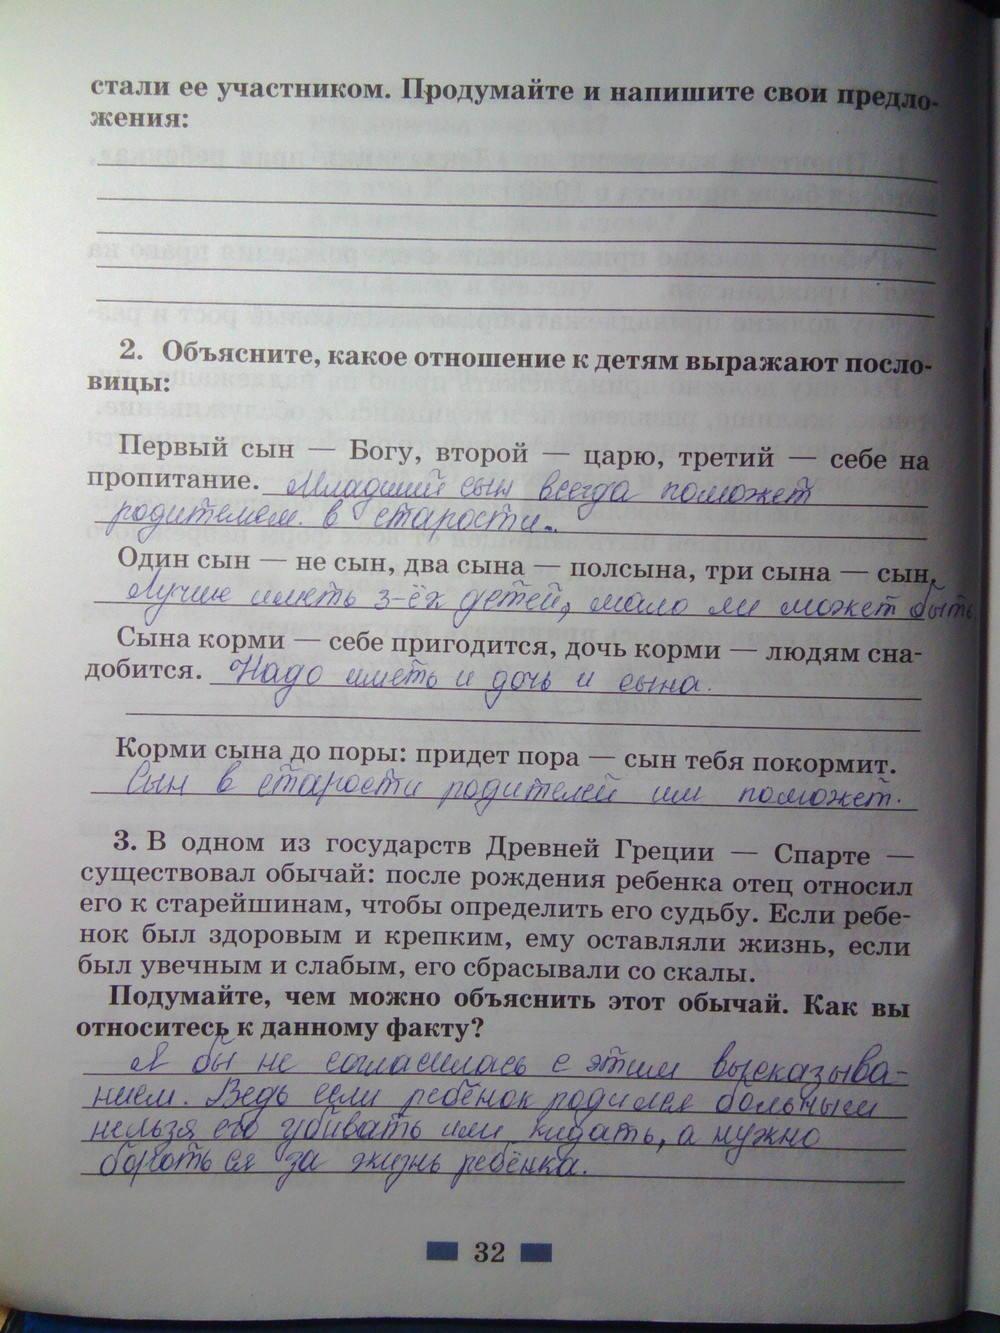 кравченко обществознанию класс гдз по за 5